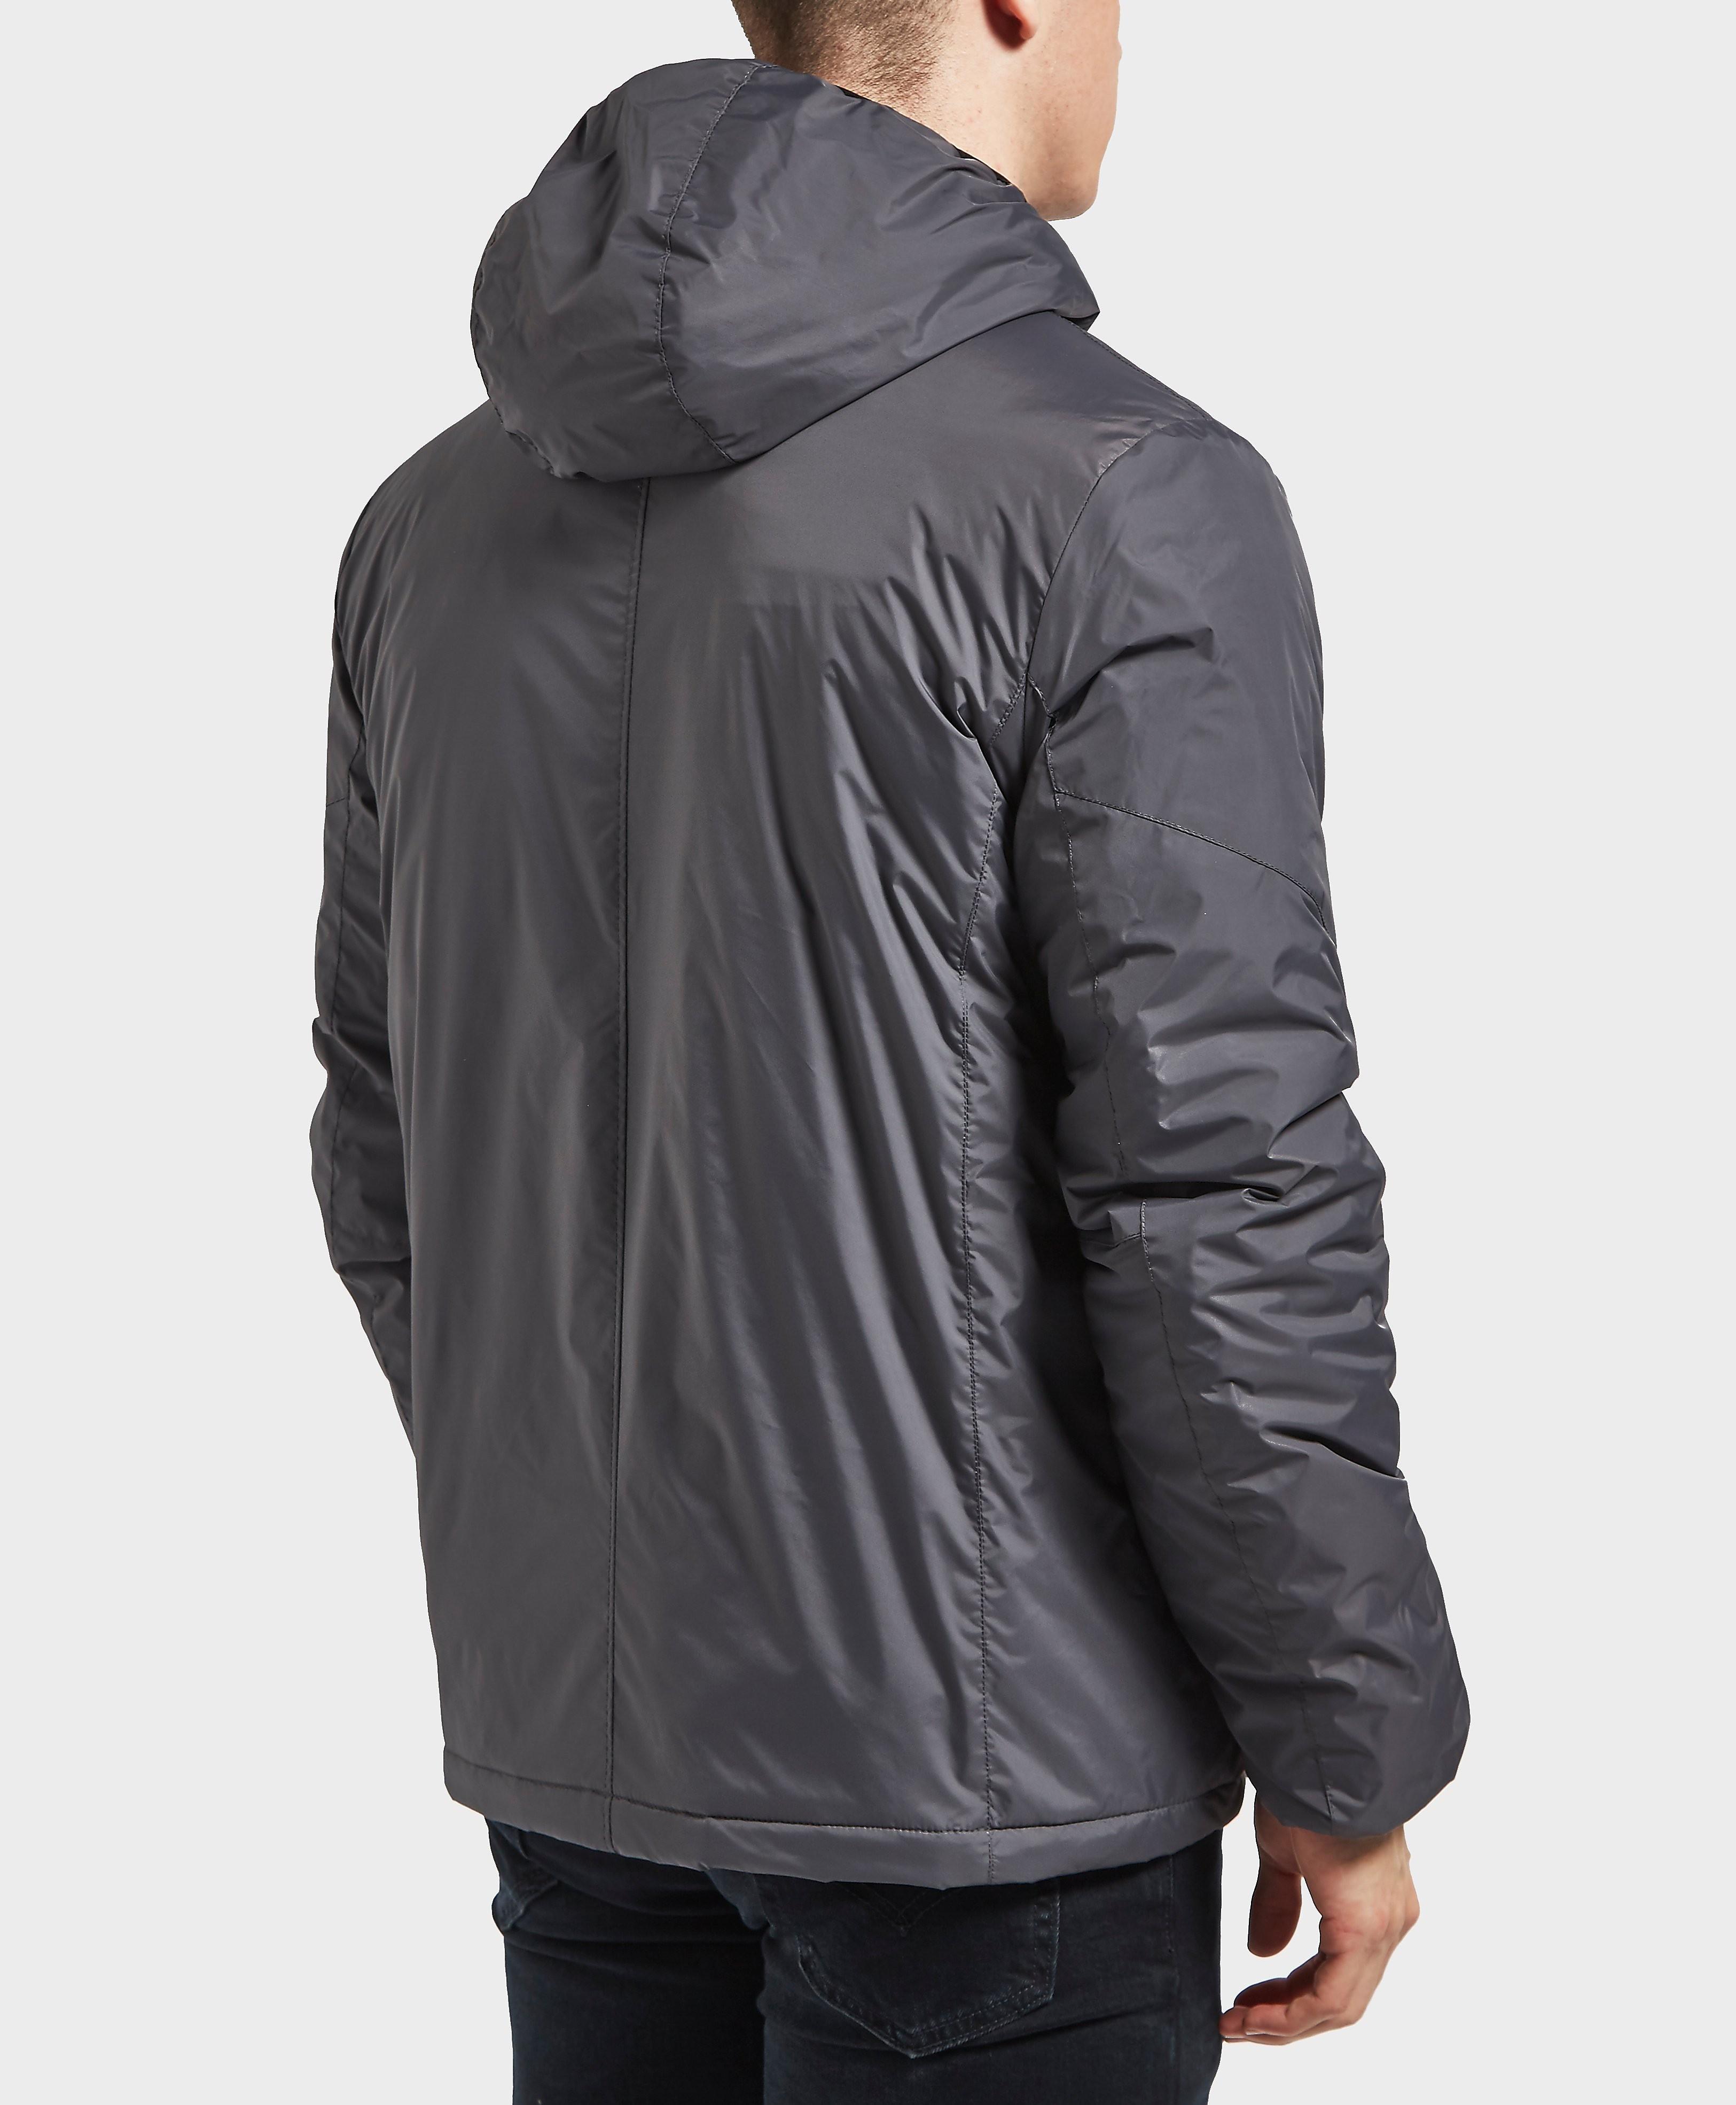 NORTH SAILS Nylon Padded Windbreaker Jacket